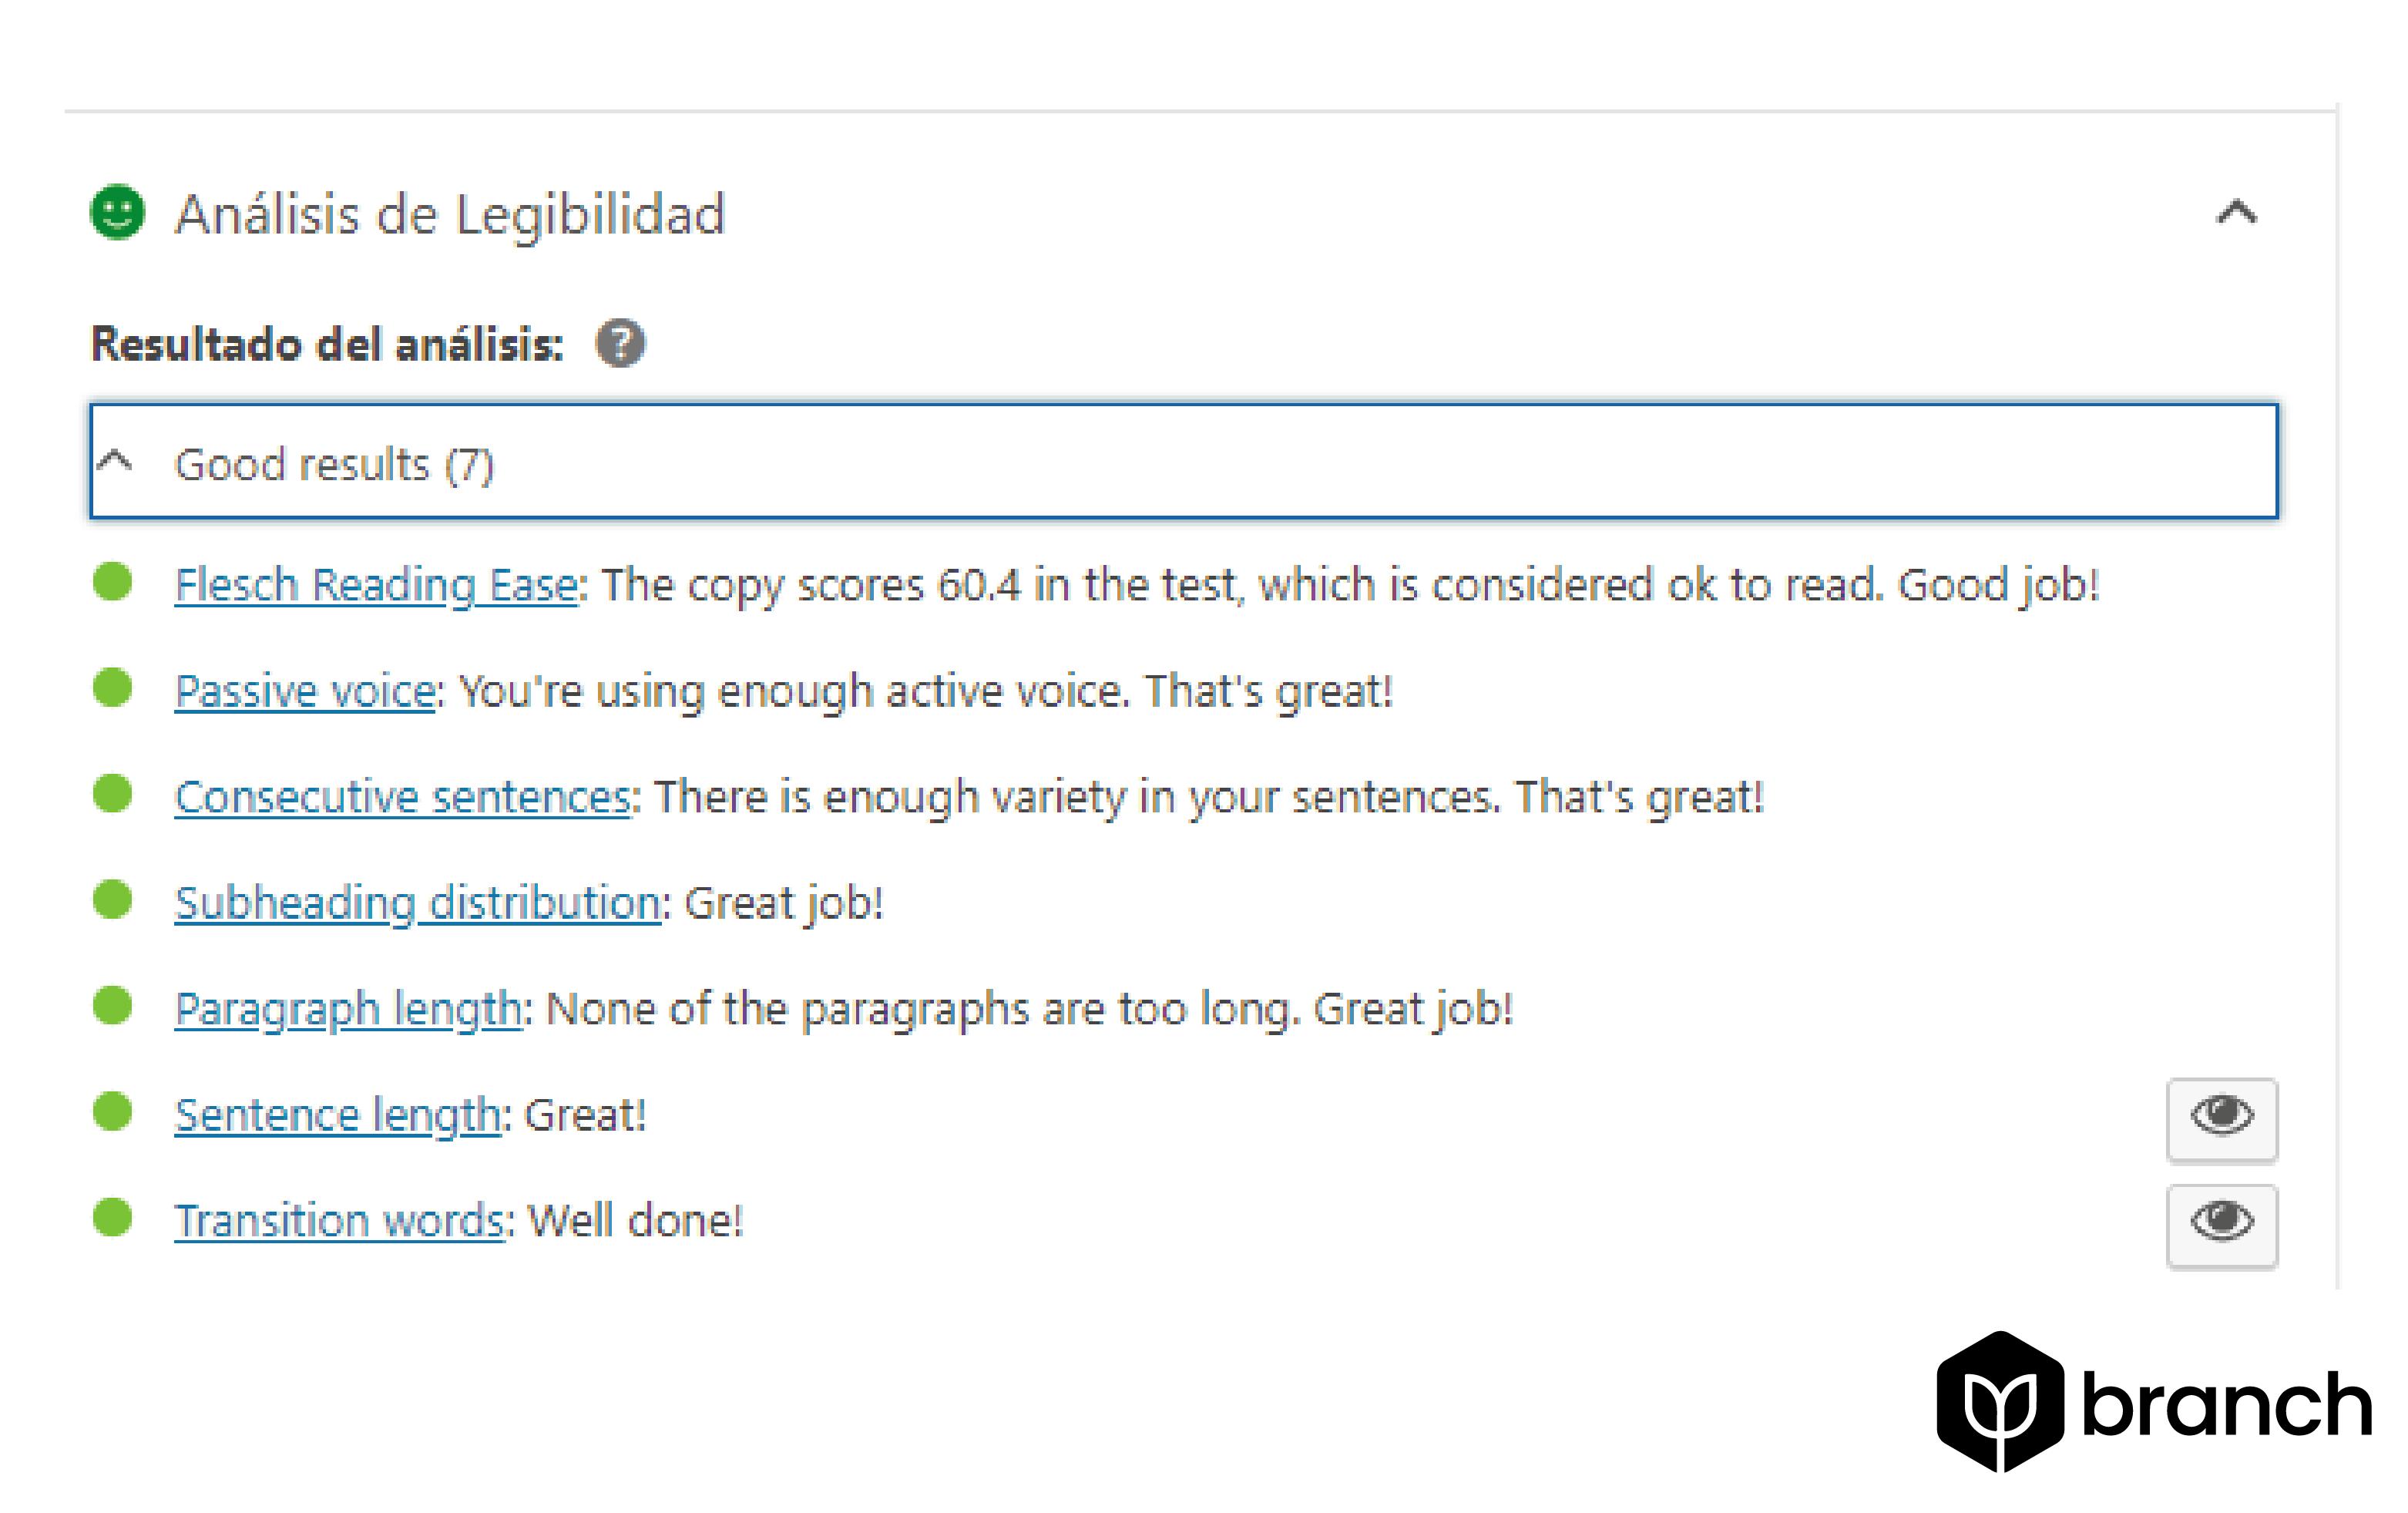 analisis-de-legibilidad-plugin-yoast-seo-wordpress